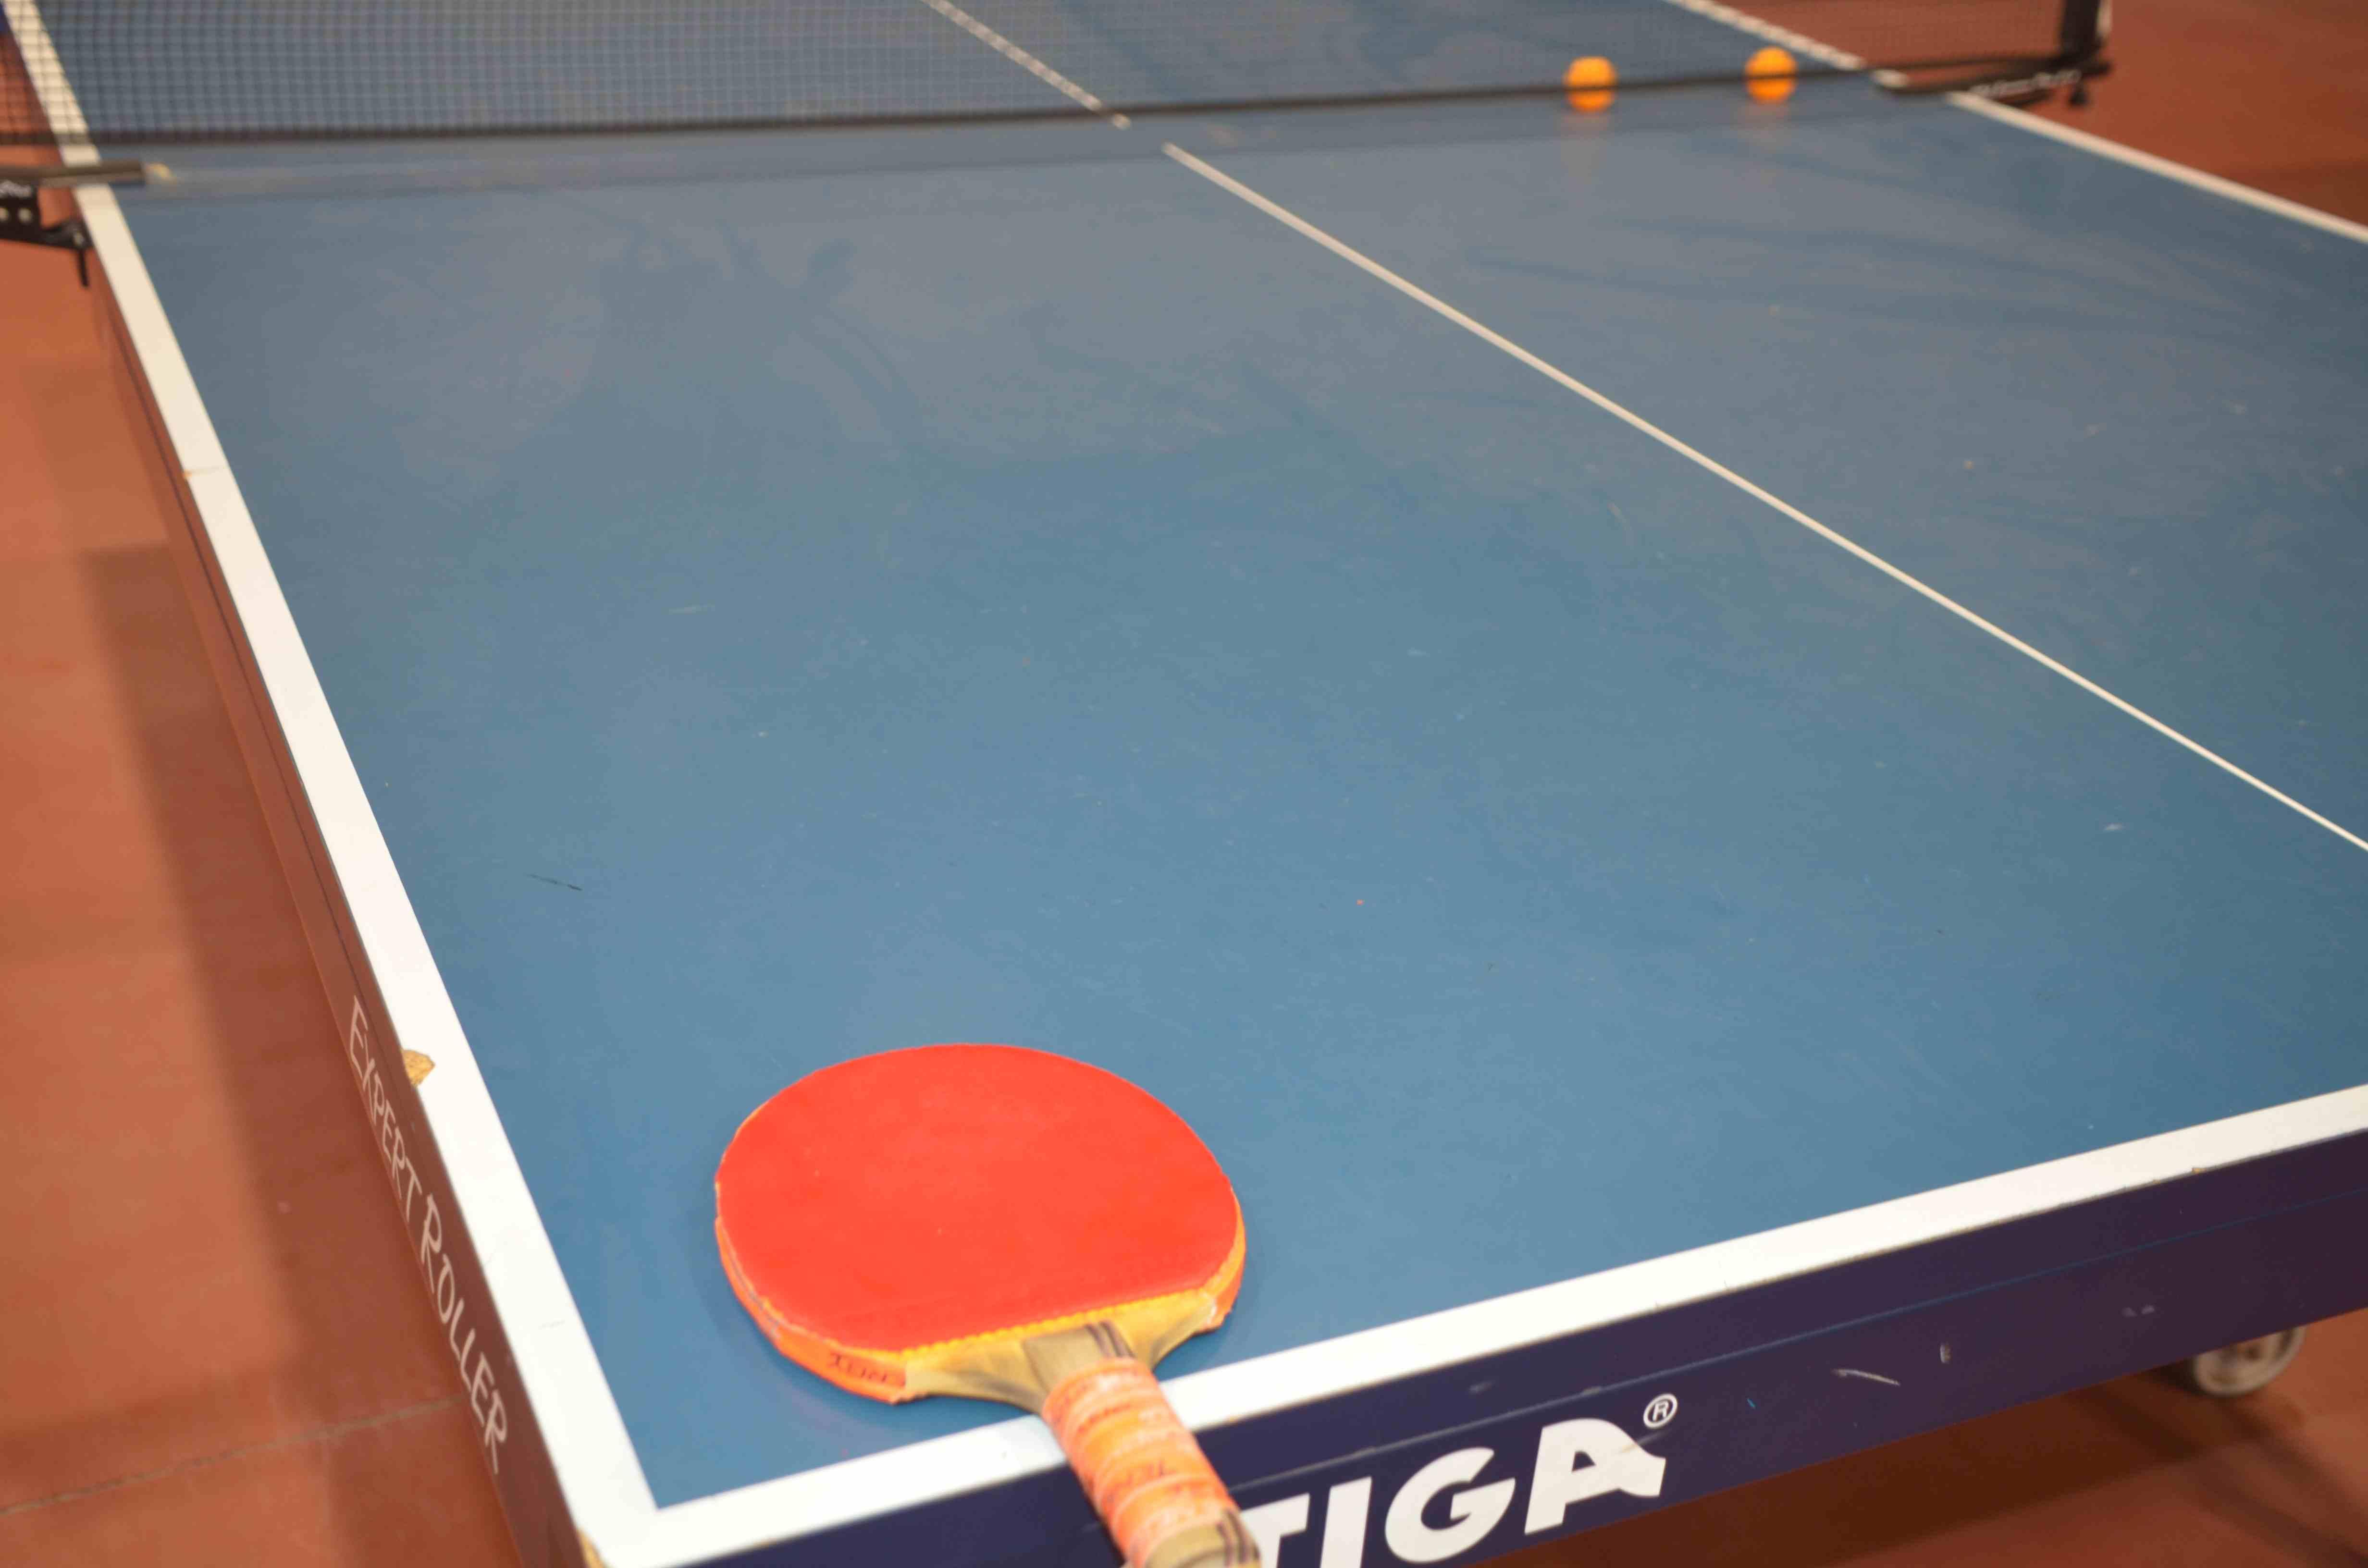 tenis-de-mesa-1